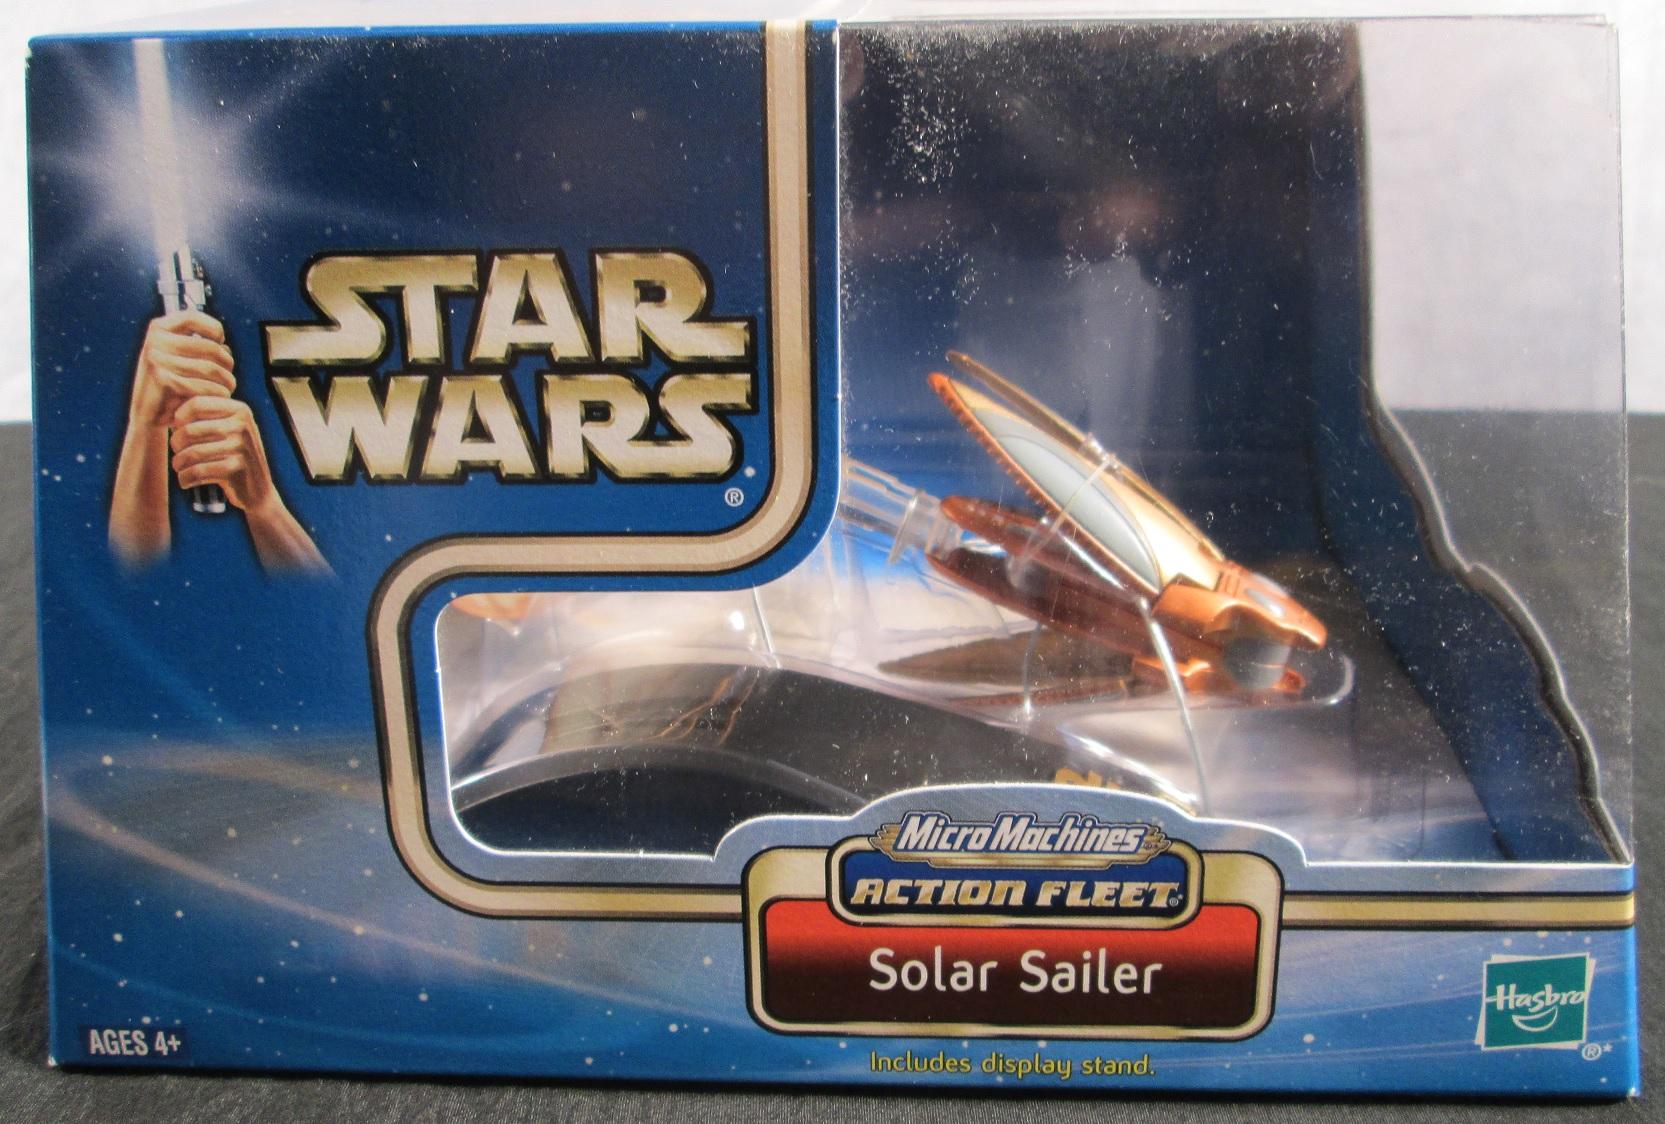 Star Wars Hasbro Micro Machines Action Fleet AT-TE 2002 Sealed